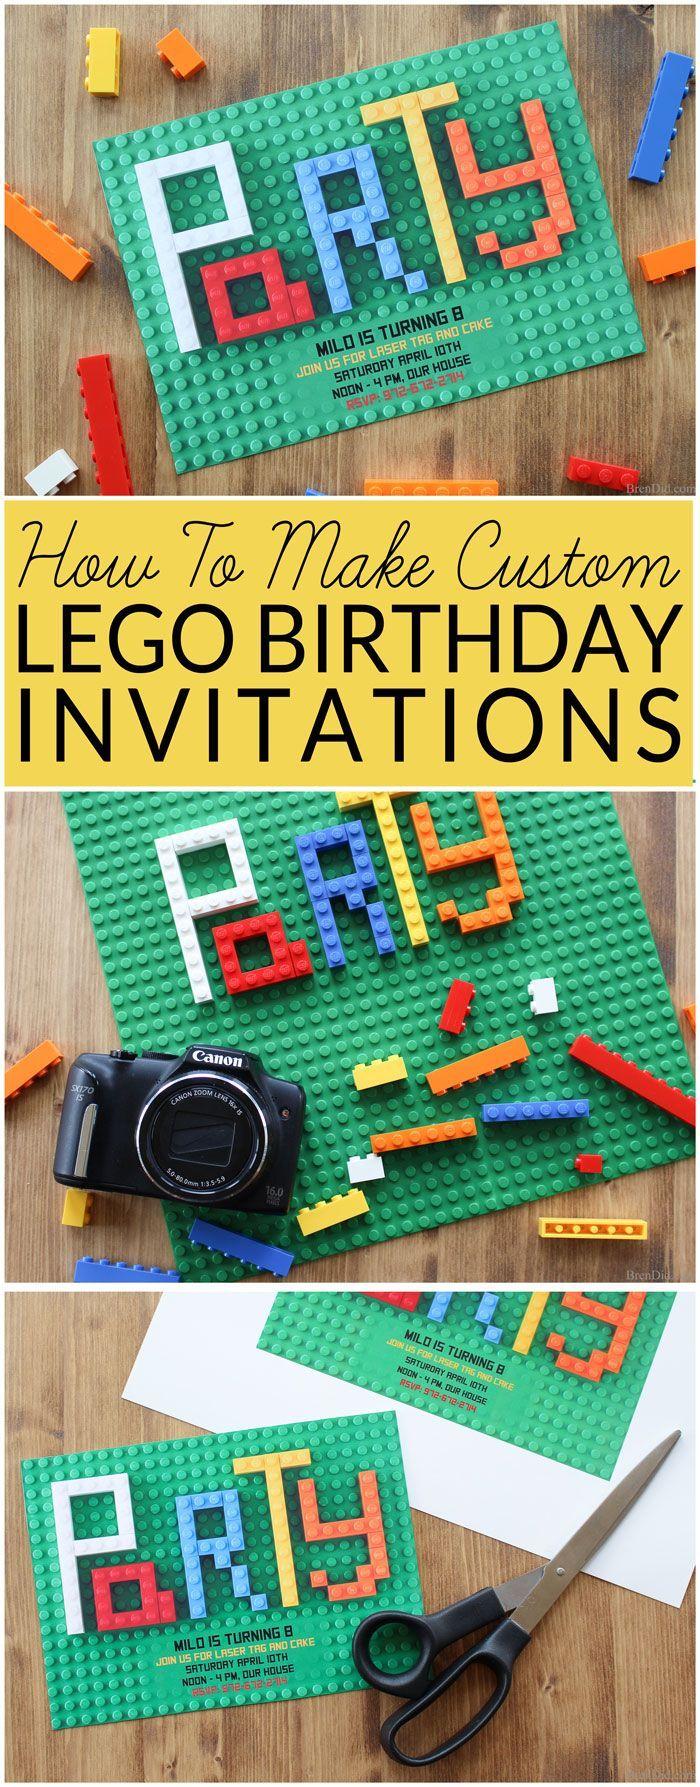 Free Lego Birthday Party Invitations Lego party invitations Diy